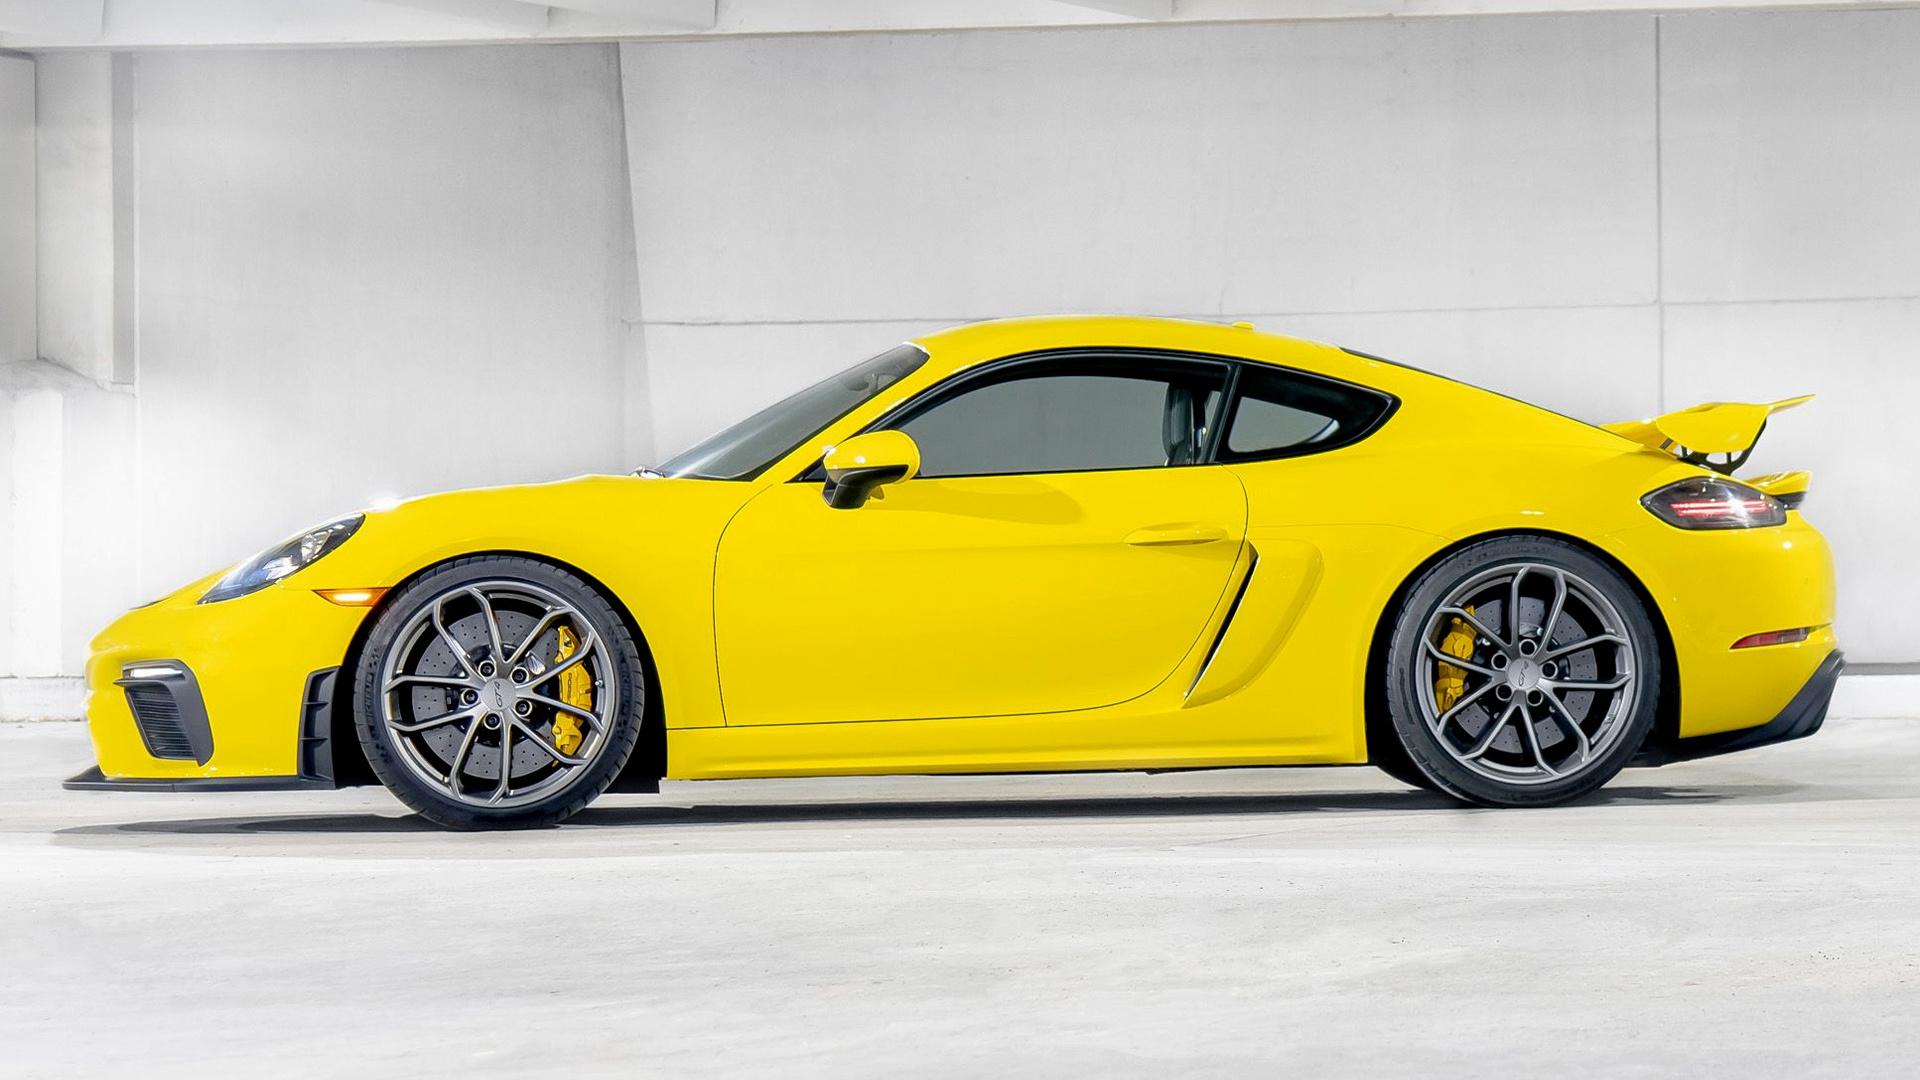 2020 Porsche 718 Cayman Gt4 Papel De Parede Hd Plano De Fundo 1920x1080 Id 1107705 Wallpaper Abyss